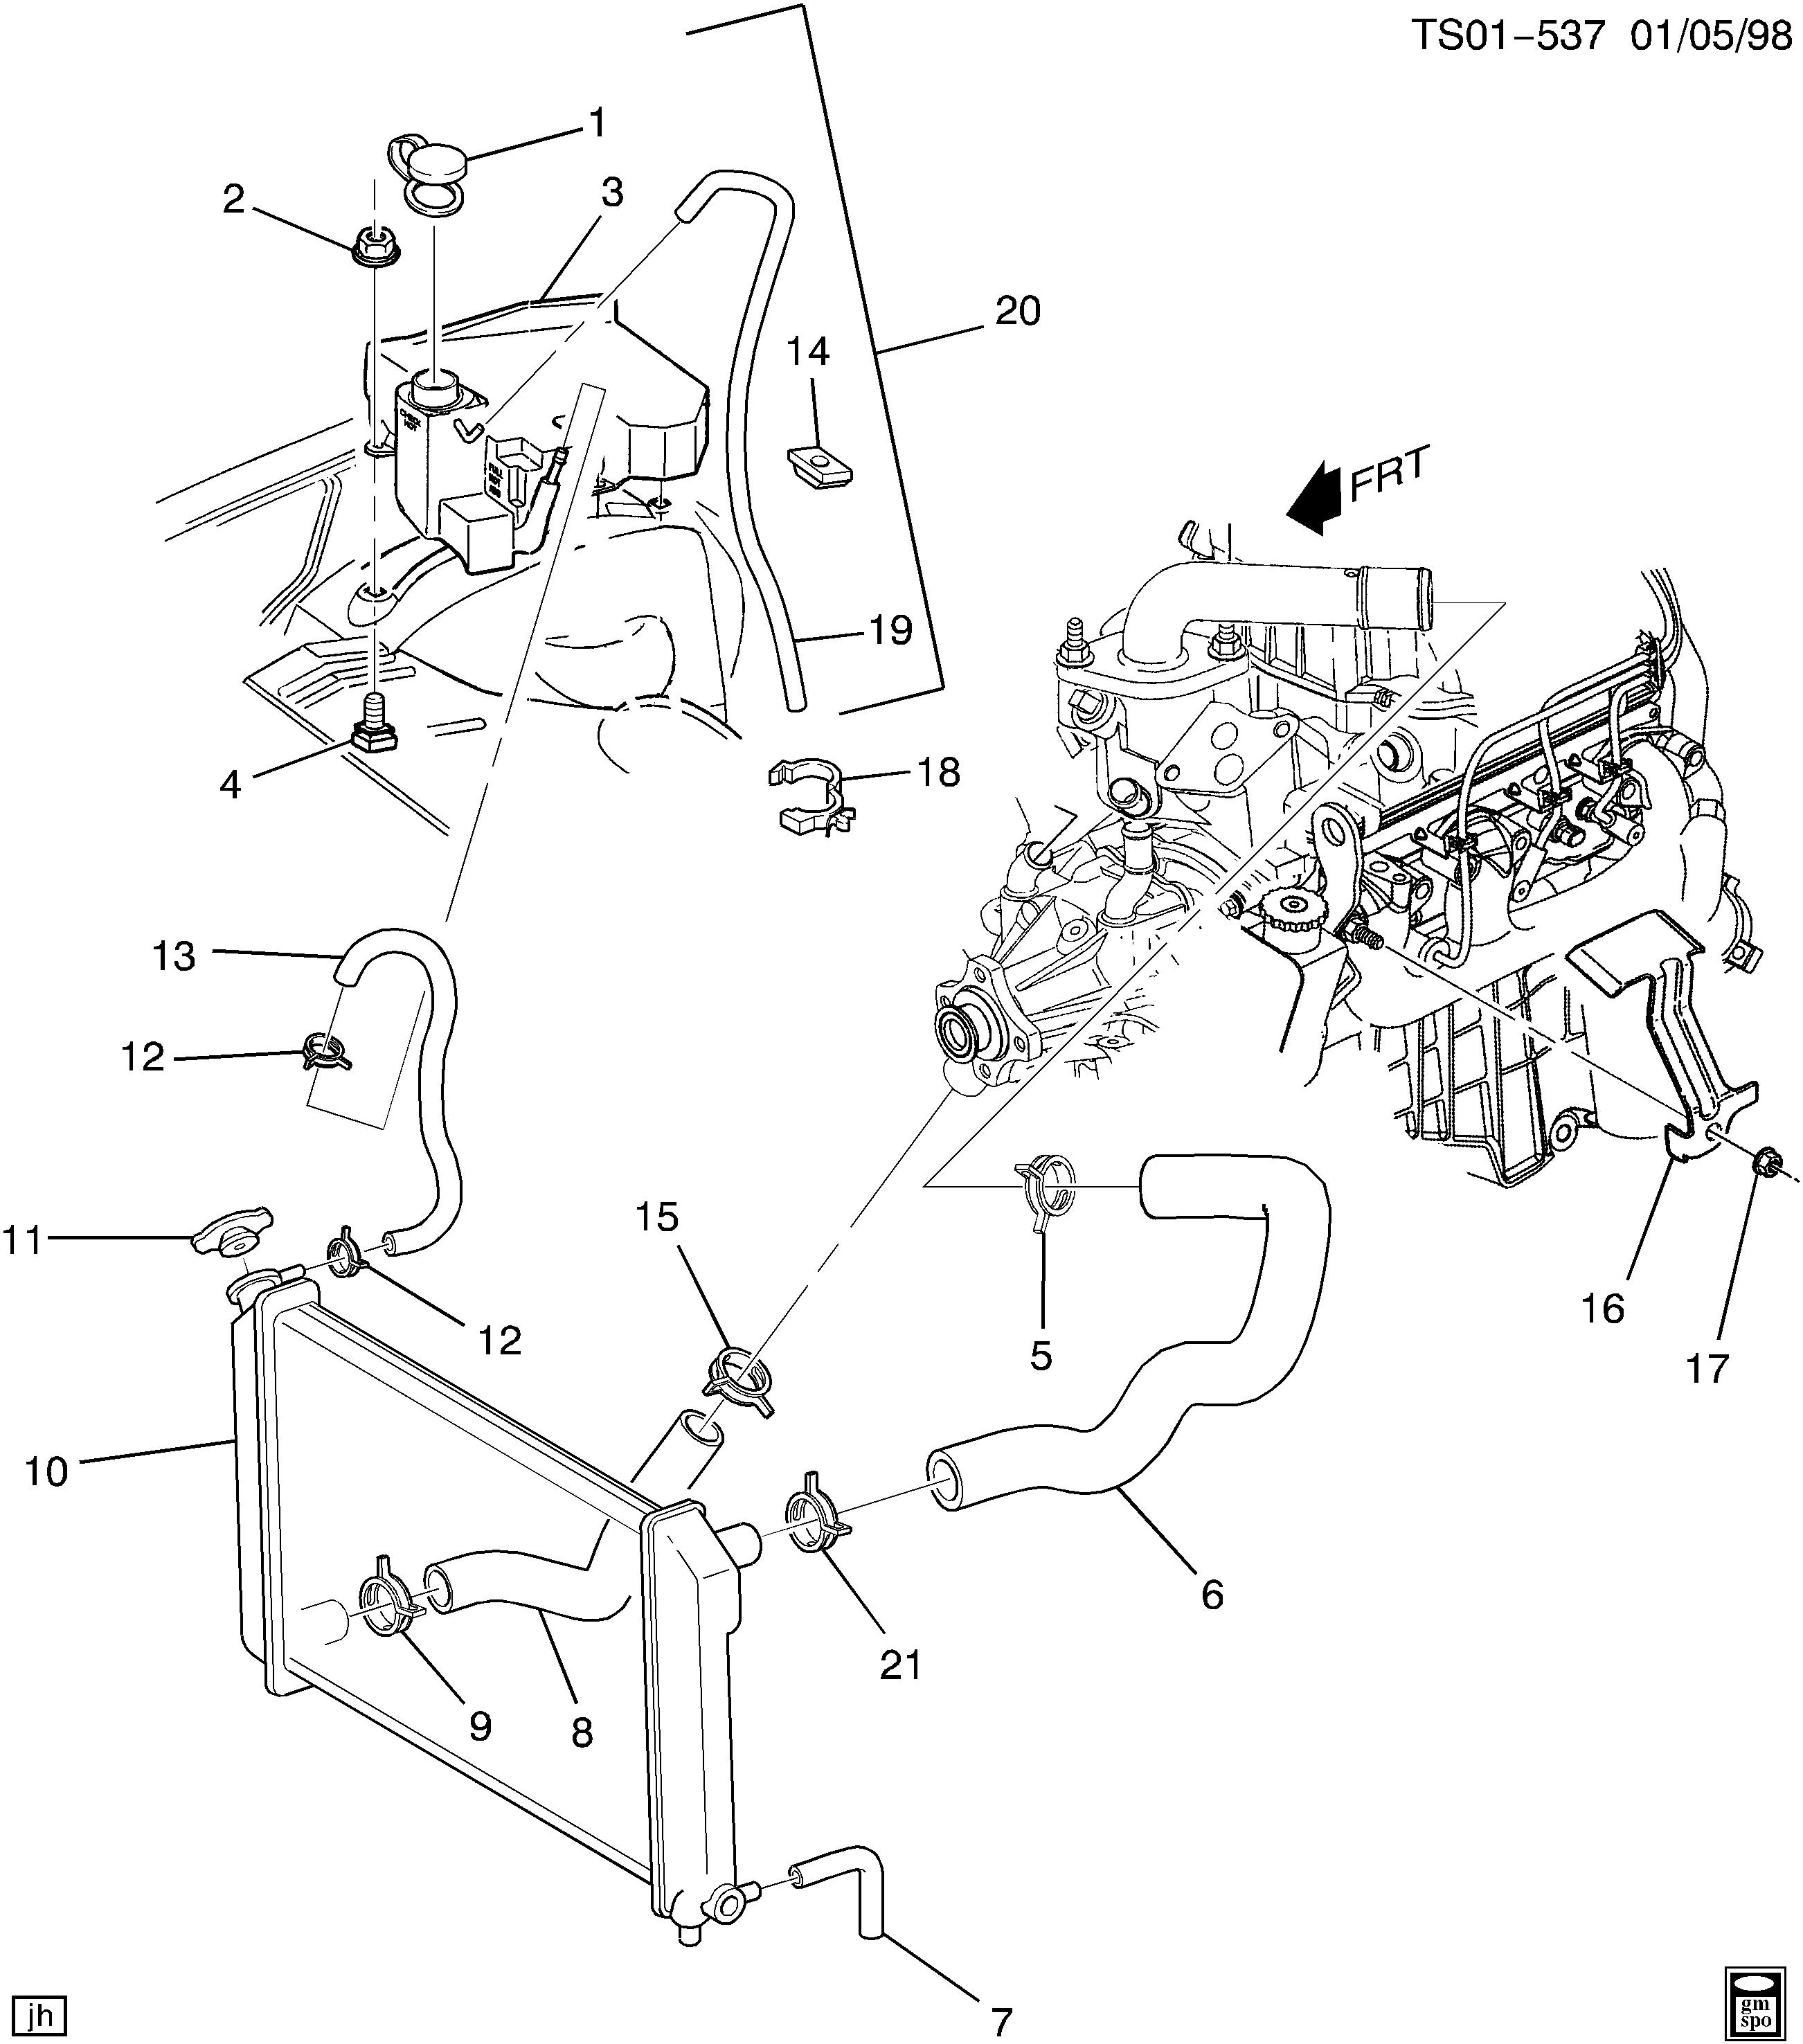 gm engine coolant diagram - wiring diagram schema rush-energy -  rush-energy.atmosphereconcept.it  atmosphereconcept.it